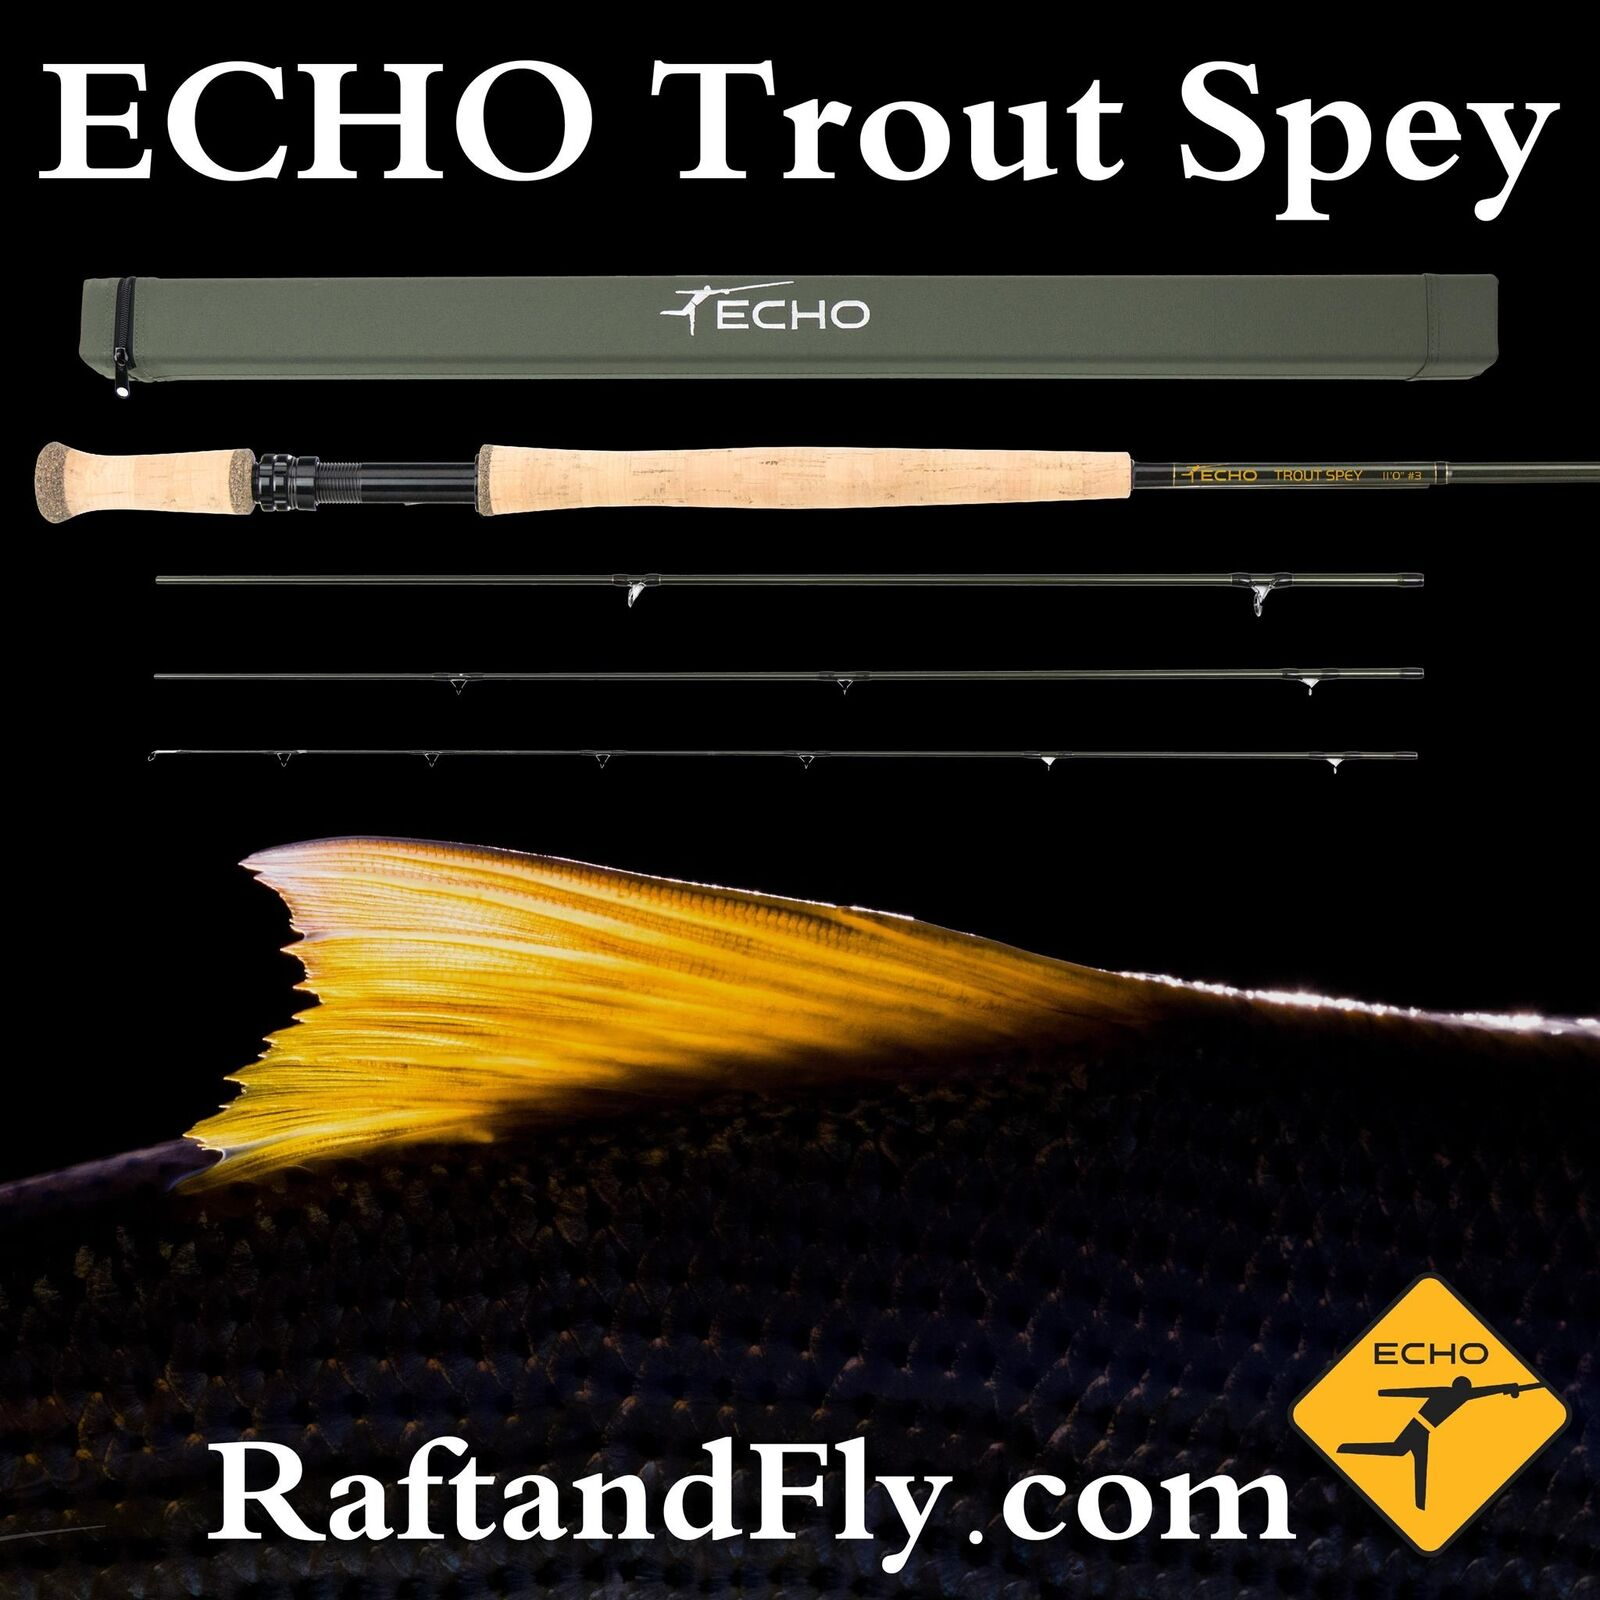 Echo Trucha Spey 4wt 11' 0  - Liftime Garantía-Envío Gratis